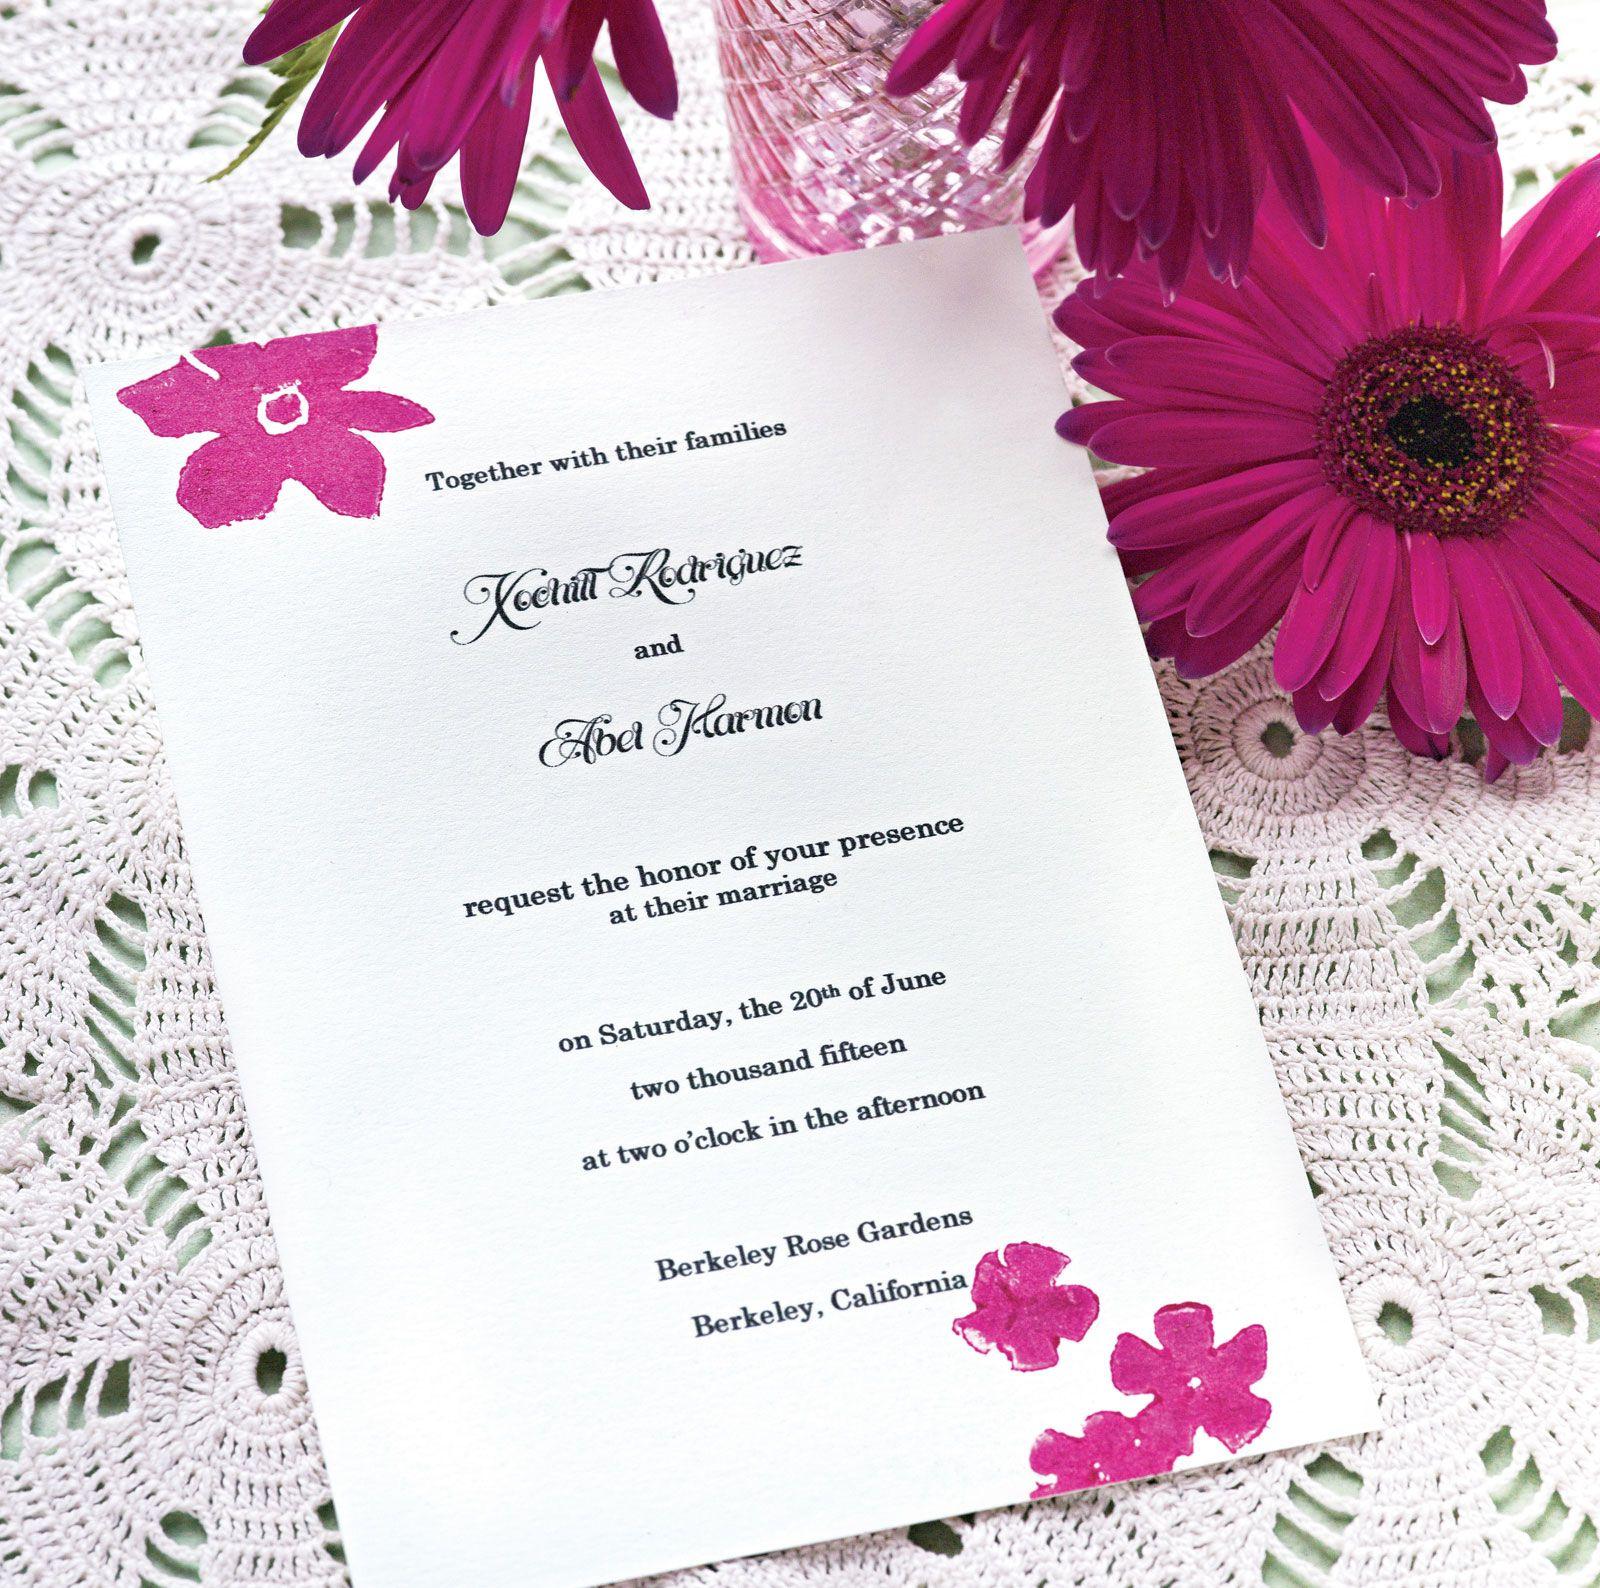 wedding invitations print your own wedding invitationsjpg - How To Print Your Own Wedding Invitations